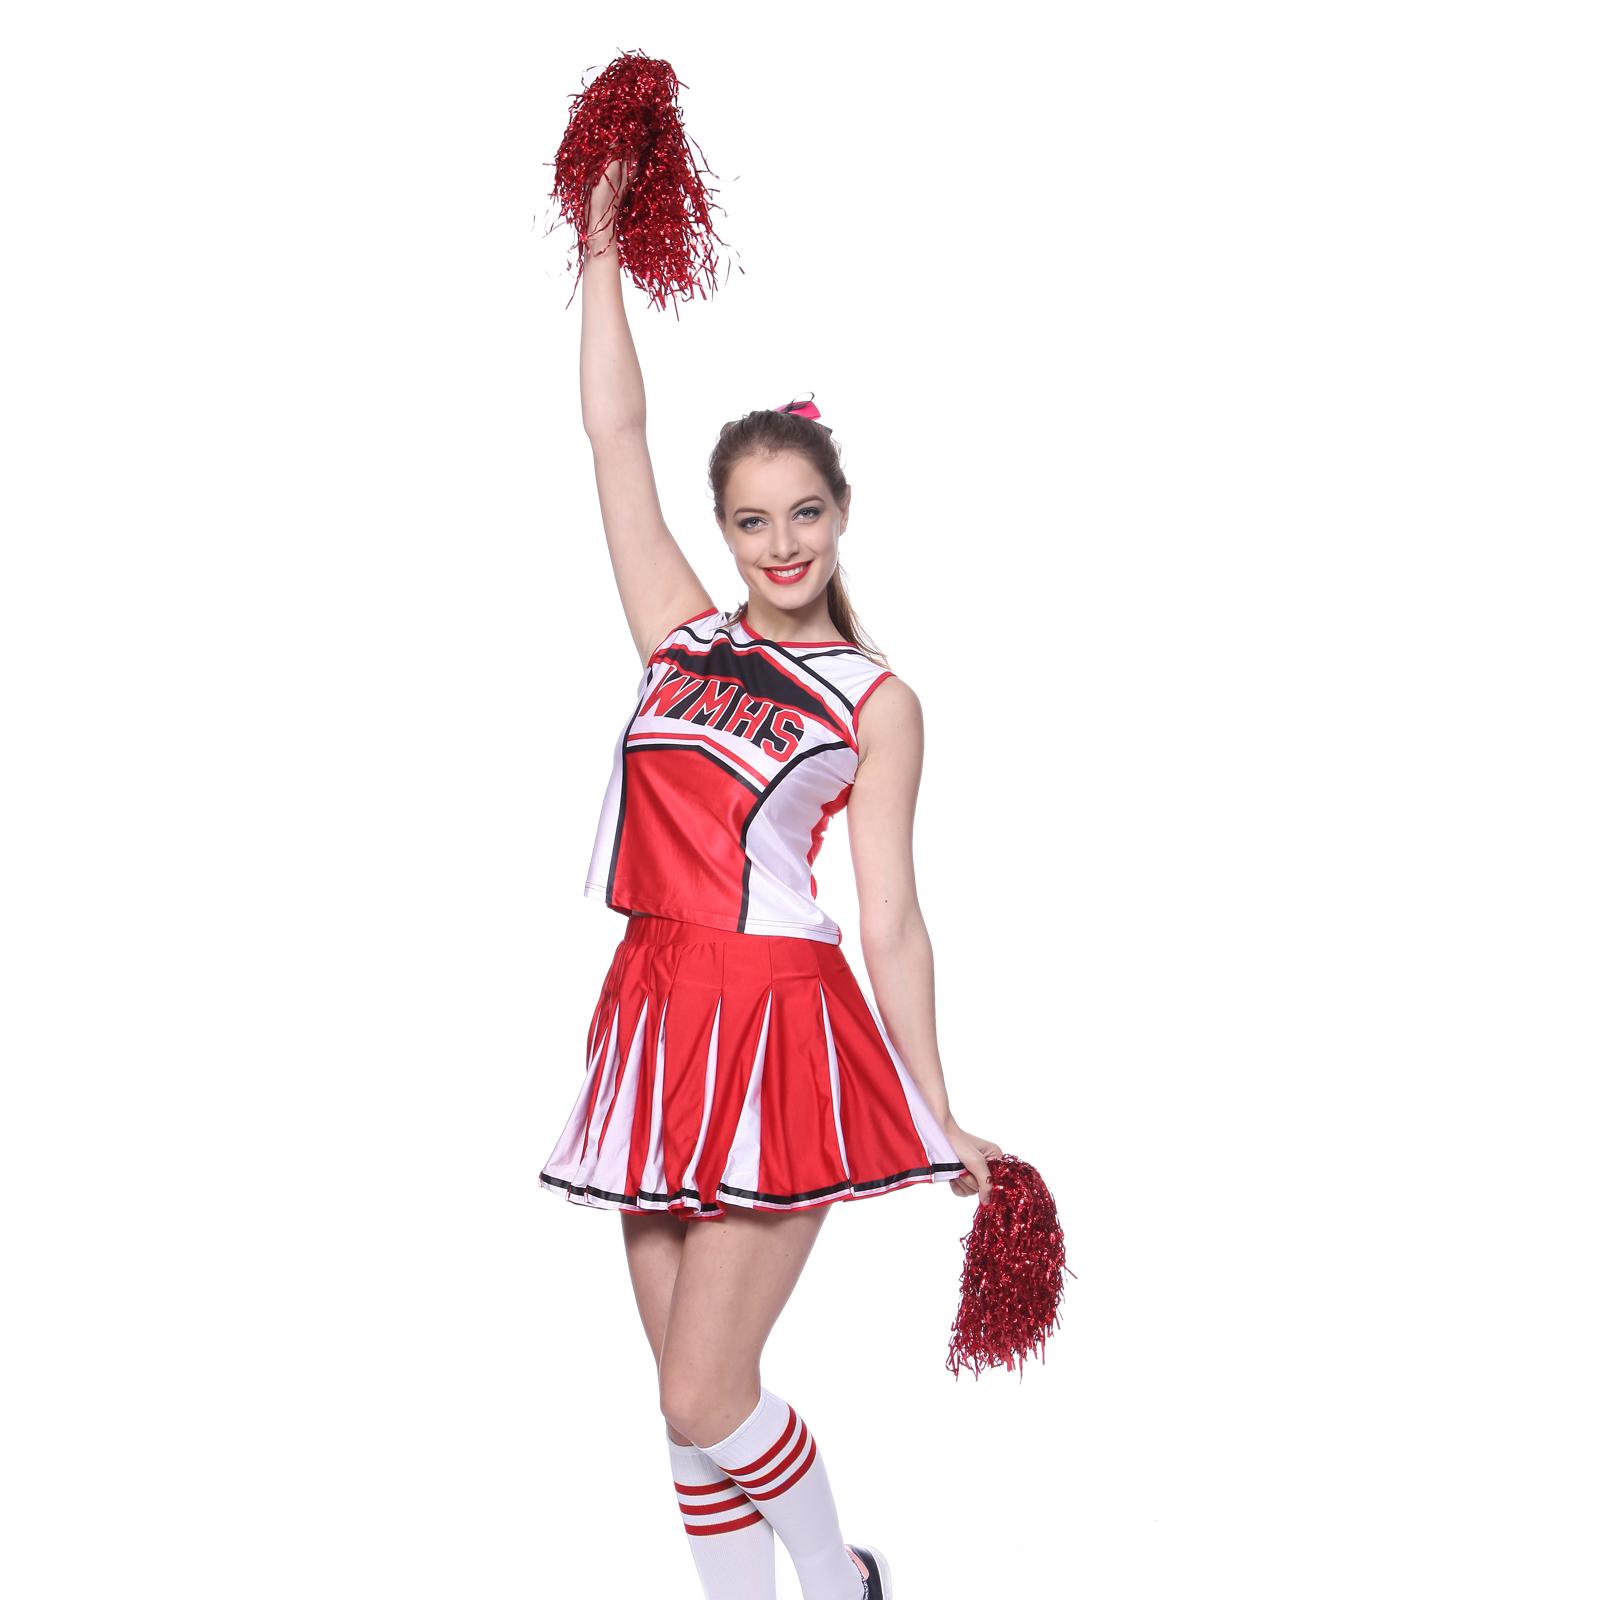 Rot-Cheerleader-Kostuem-Schoolgirl-Uniform-Cheerleading-Cheer-Leader-GOGO-XS-XXL